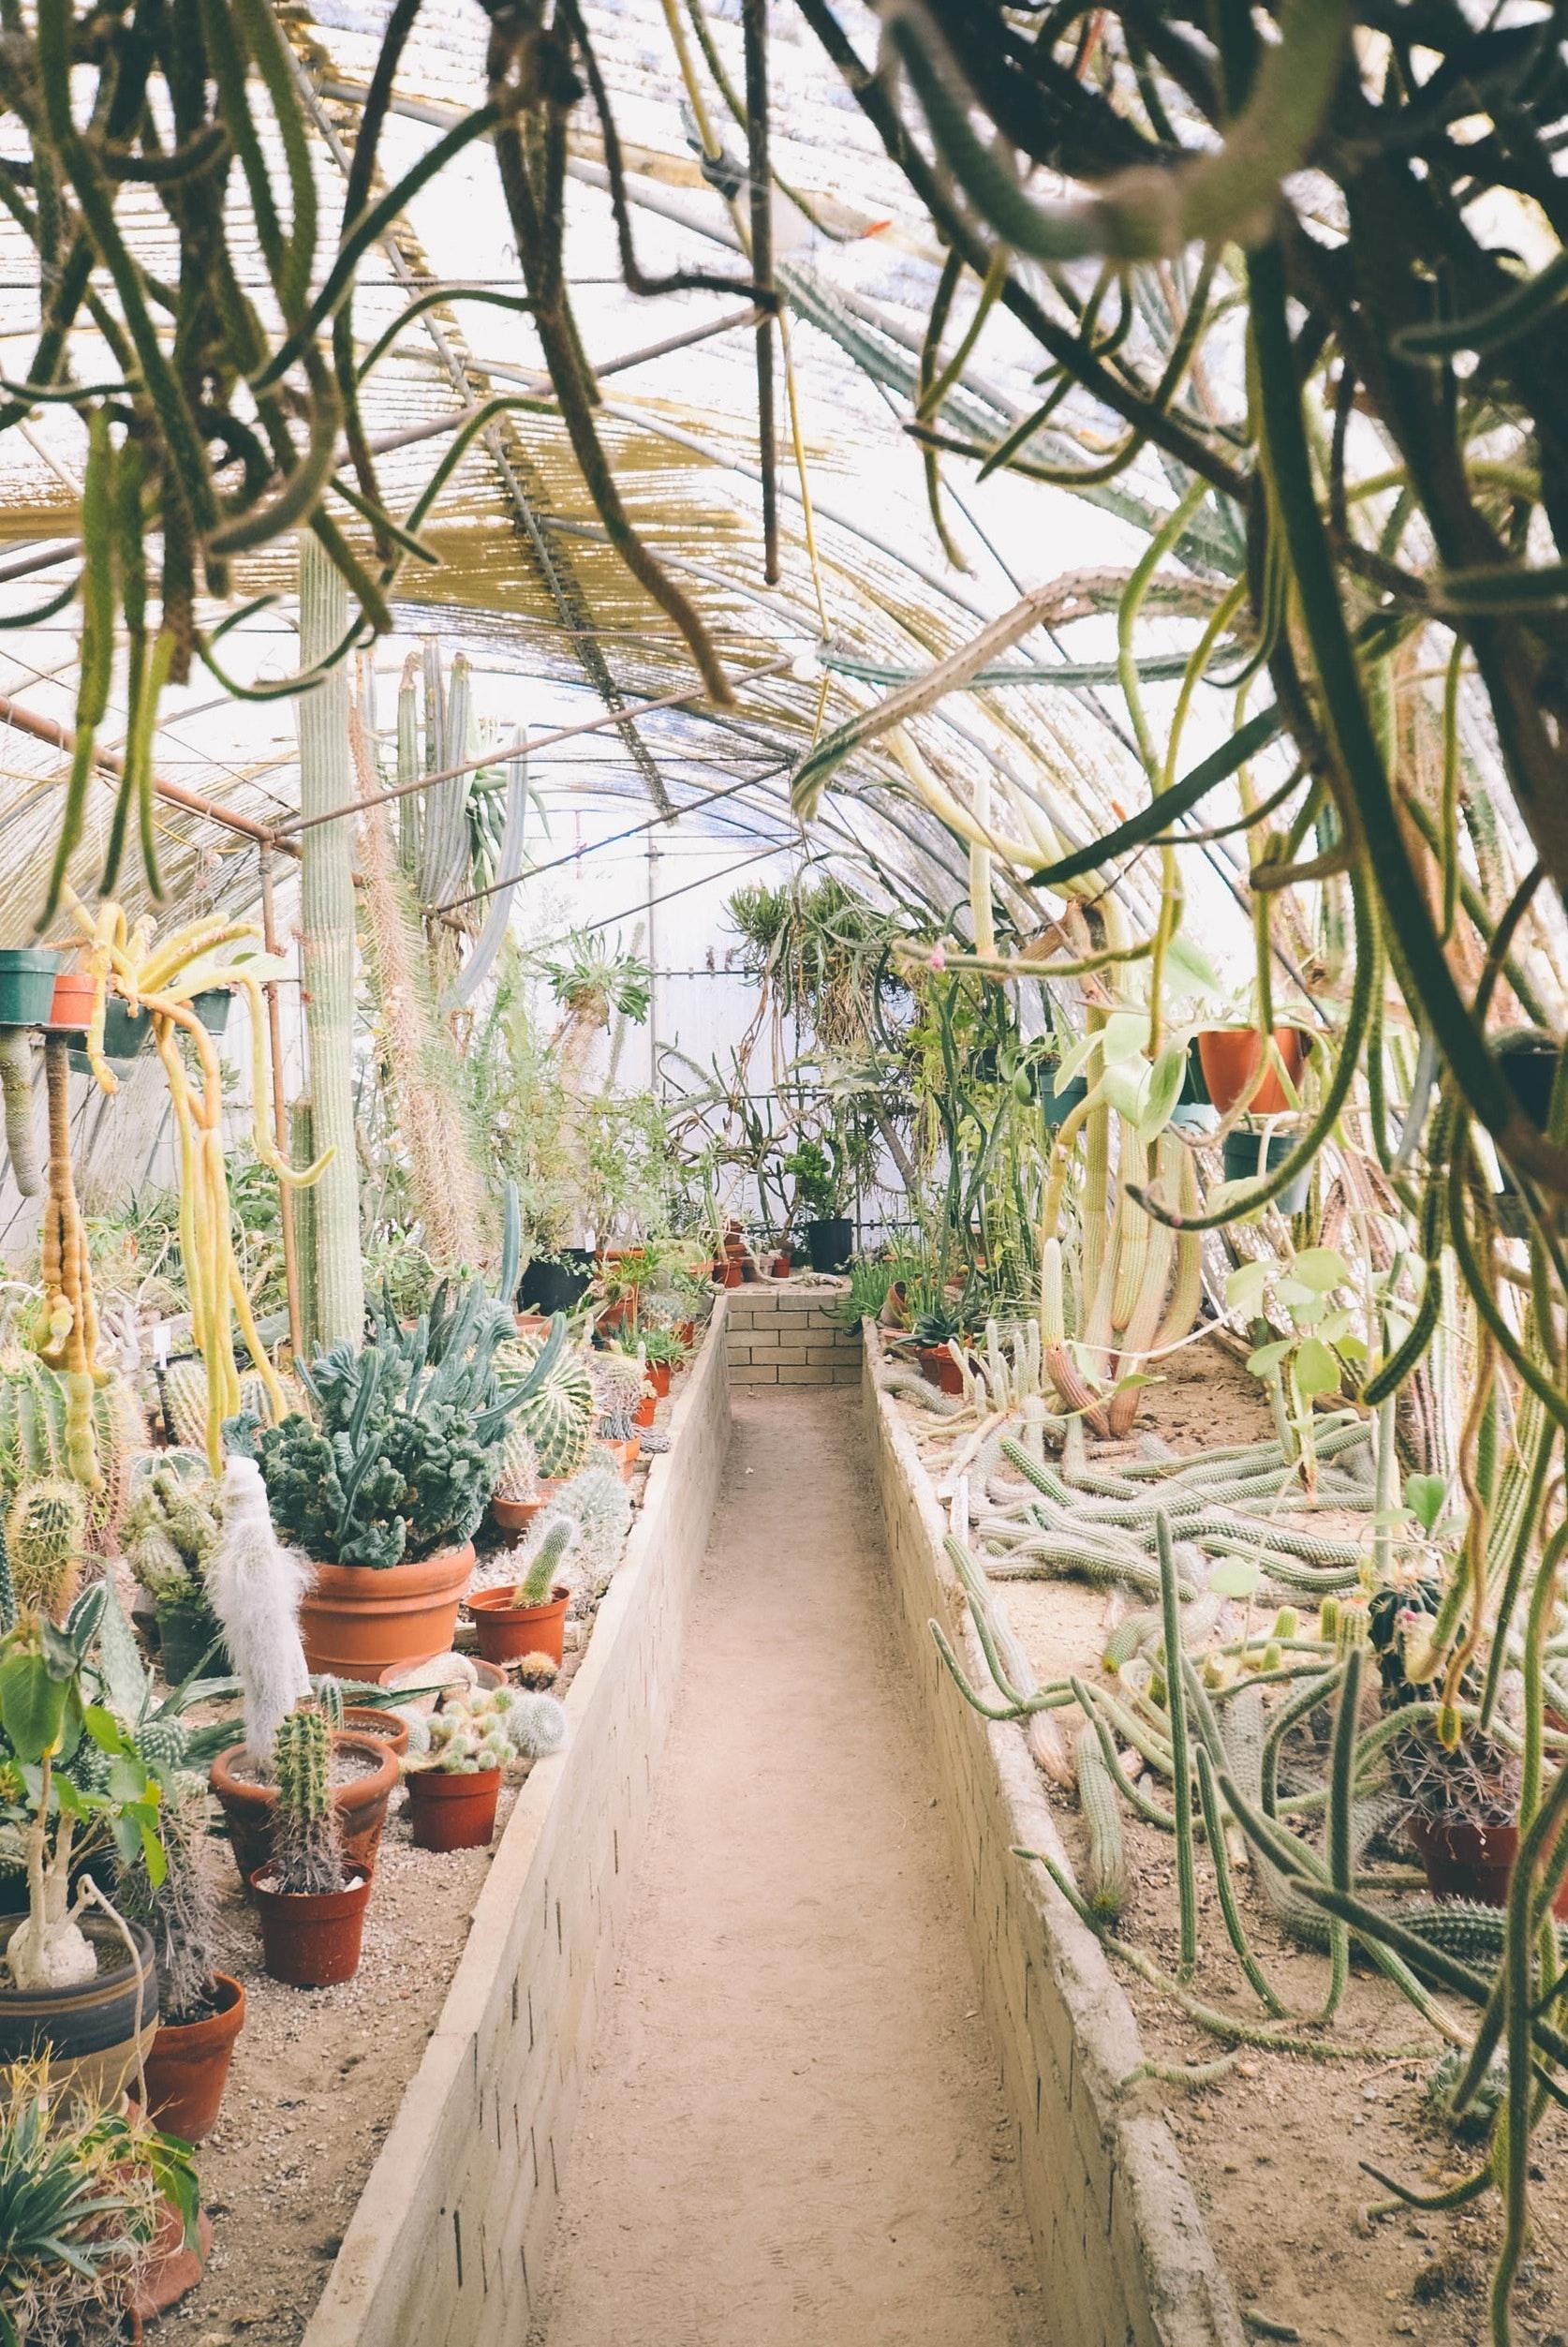 Kostenloses Foto Zum Thema Gewachshaus Kakteen Kaktus